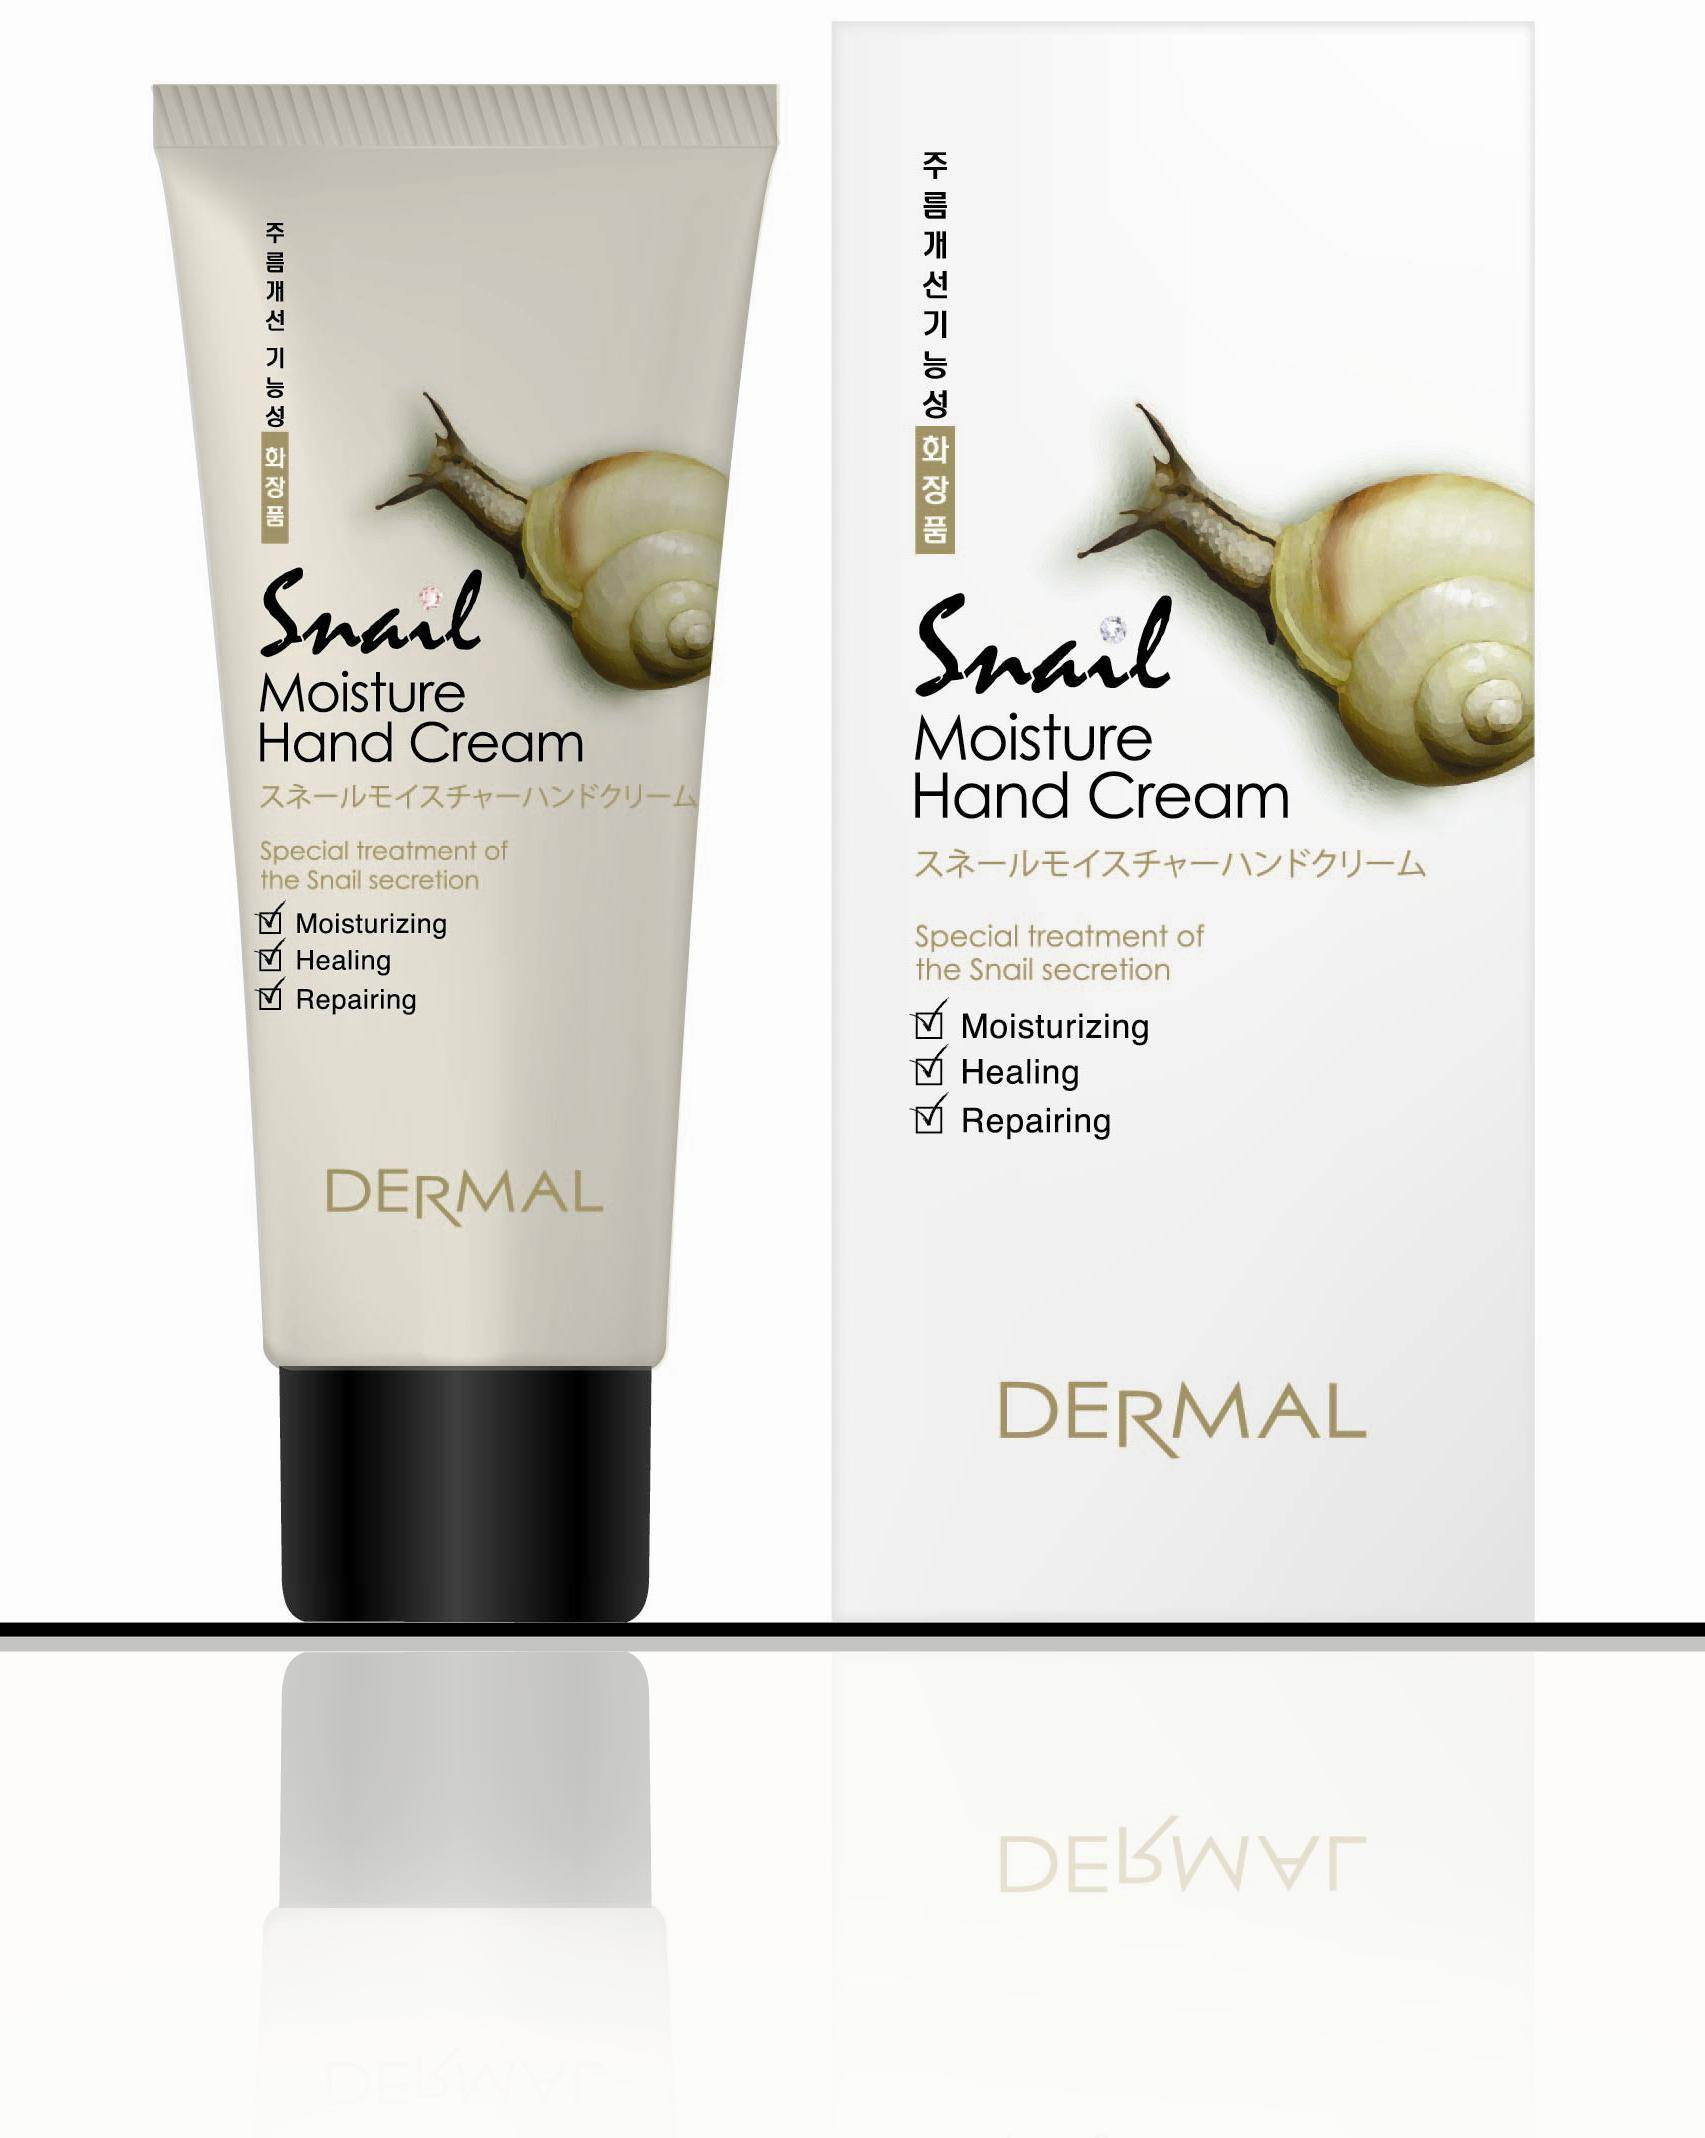 Snail Moisture hand Cream